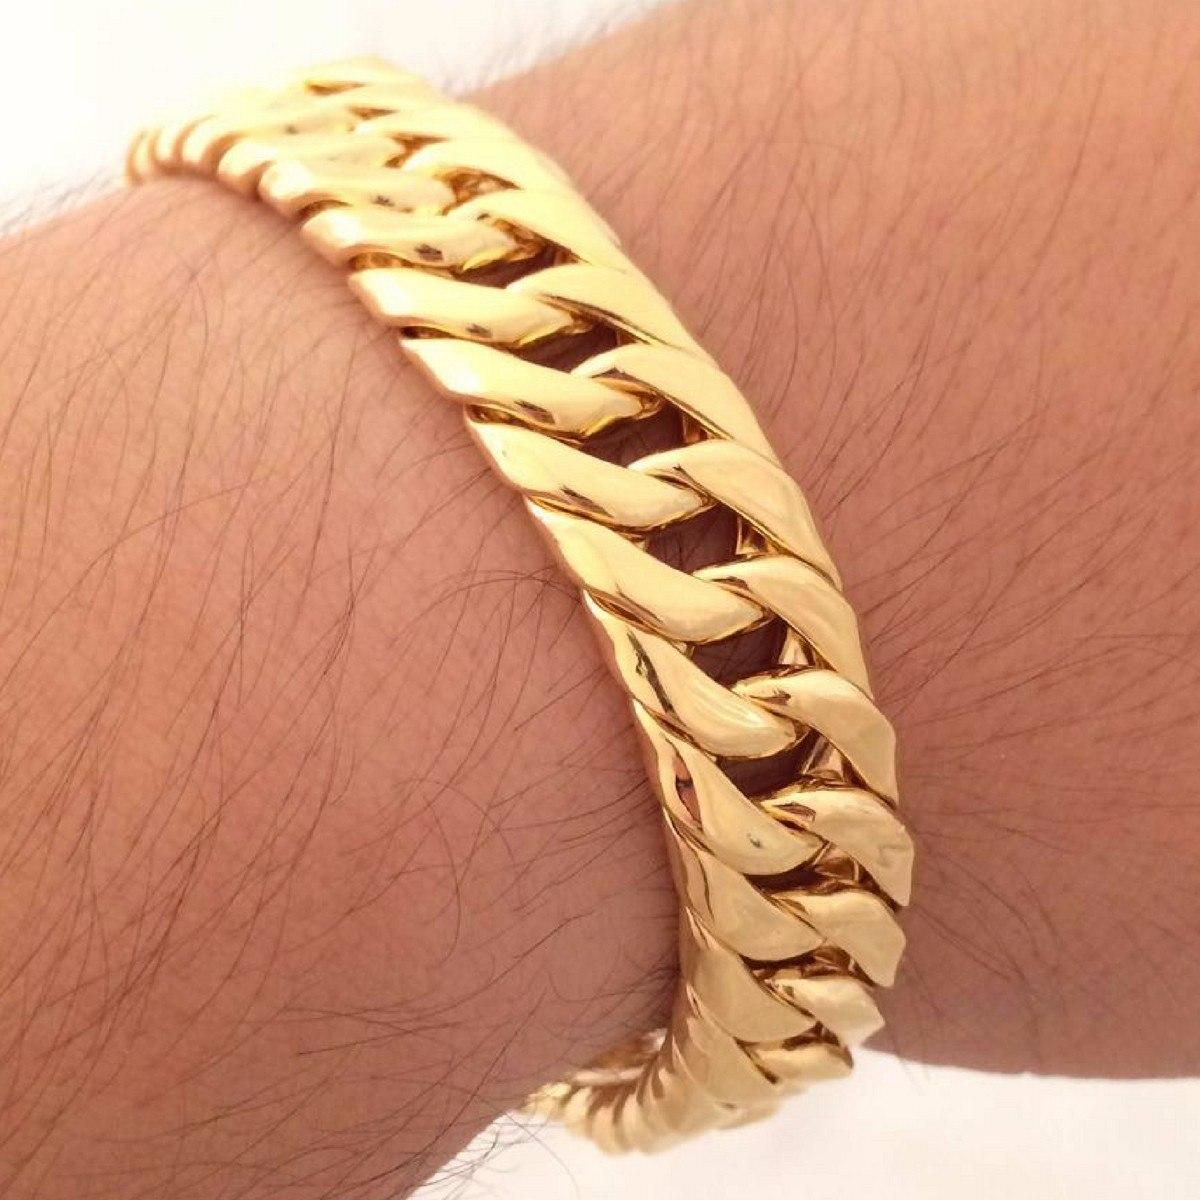 1275874f875fb pulseira masculina dourada ouro 18k banhada 11mm polida. Carregando zoom.